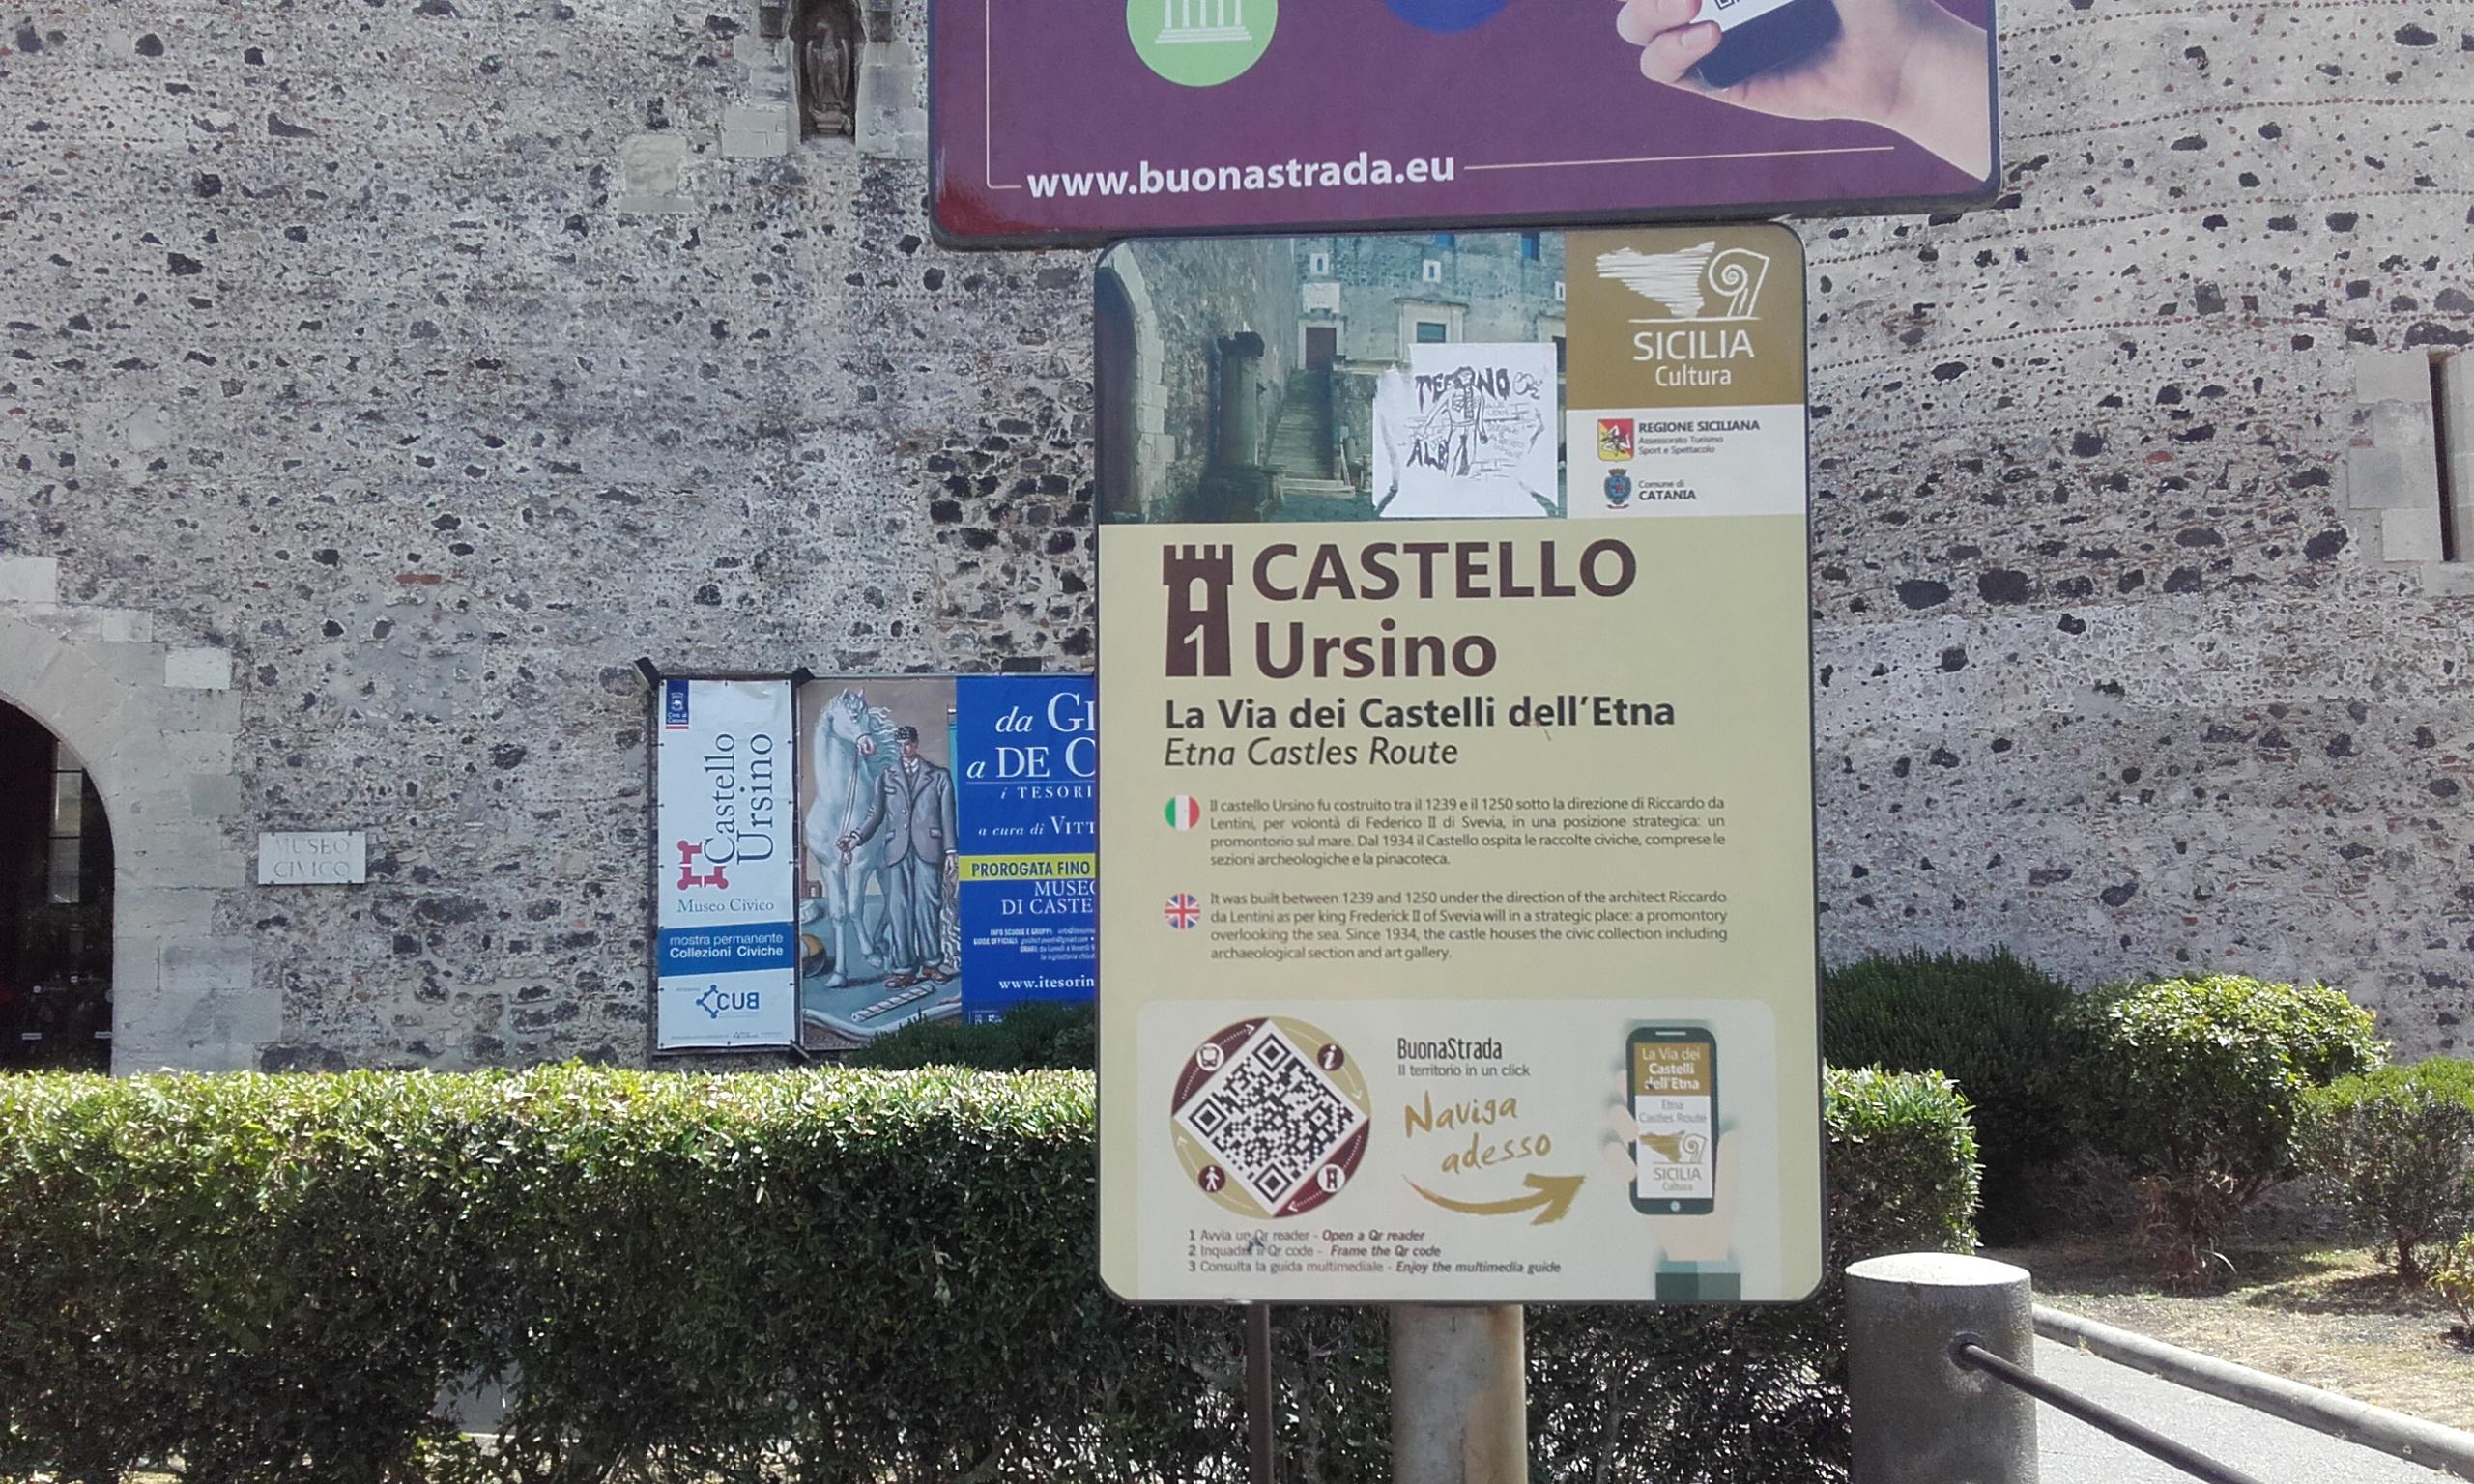 Entrada al Castillo Ursino